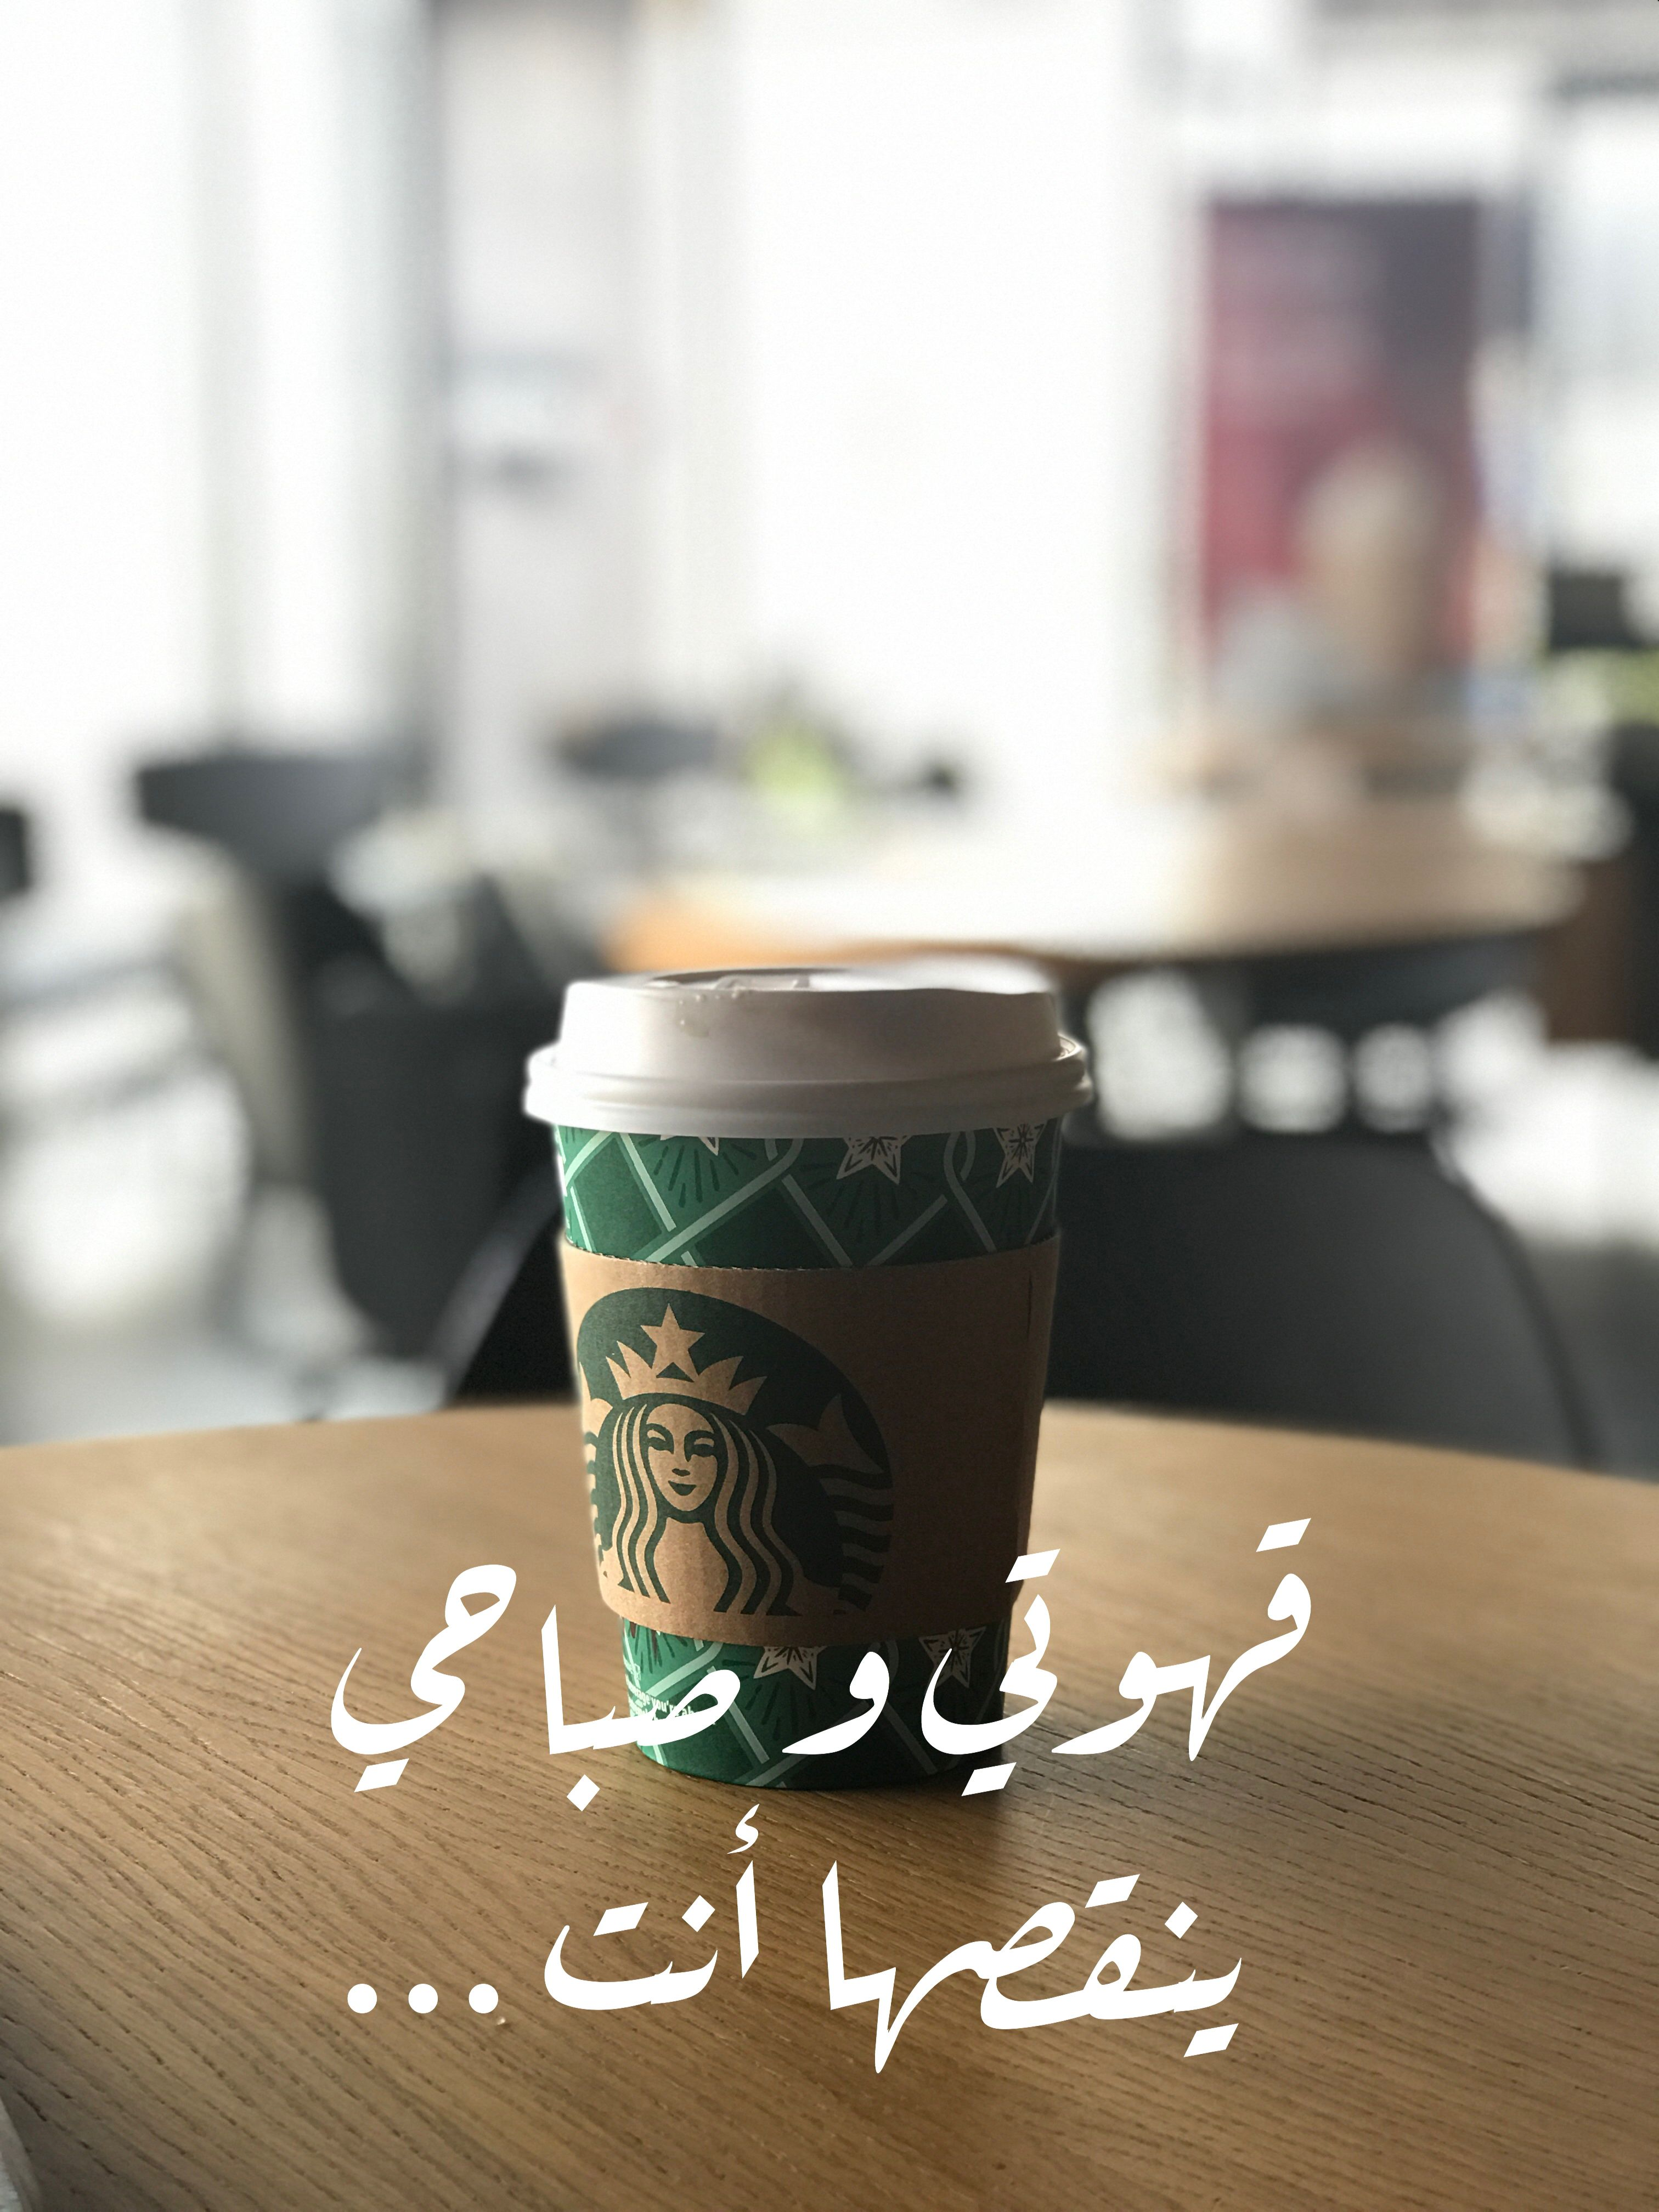 قهوتي و صباحي ينقصها أنت Coffee Board Morning Quotes Love Words